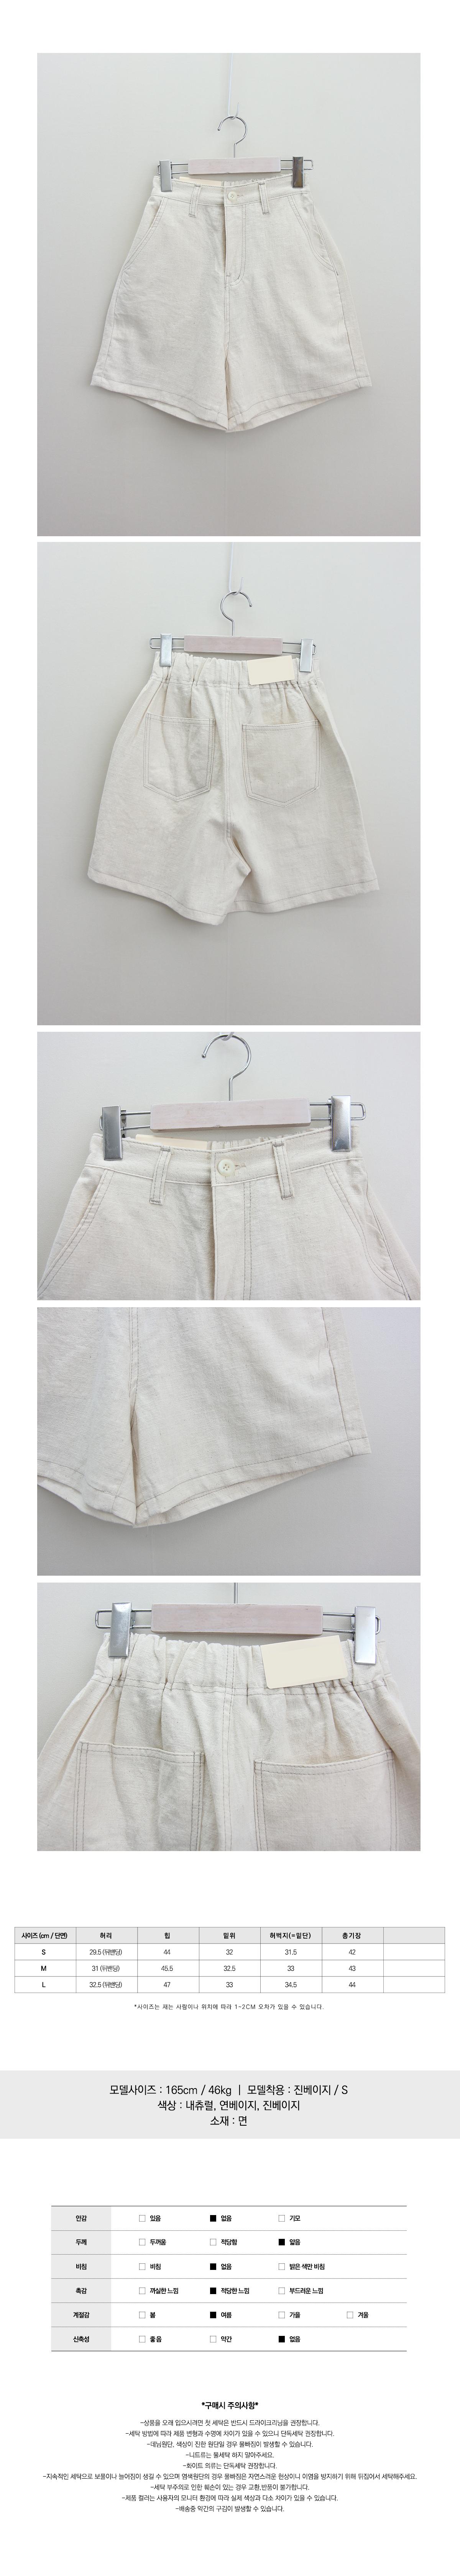 salt cool shorts